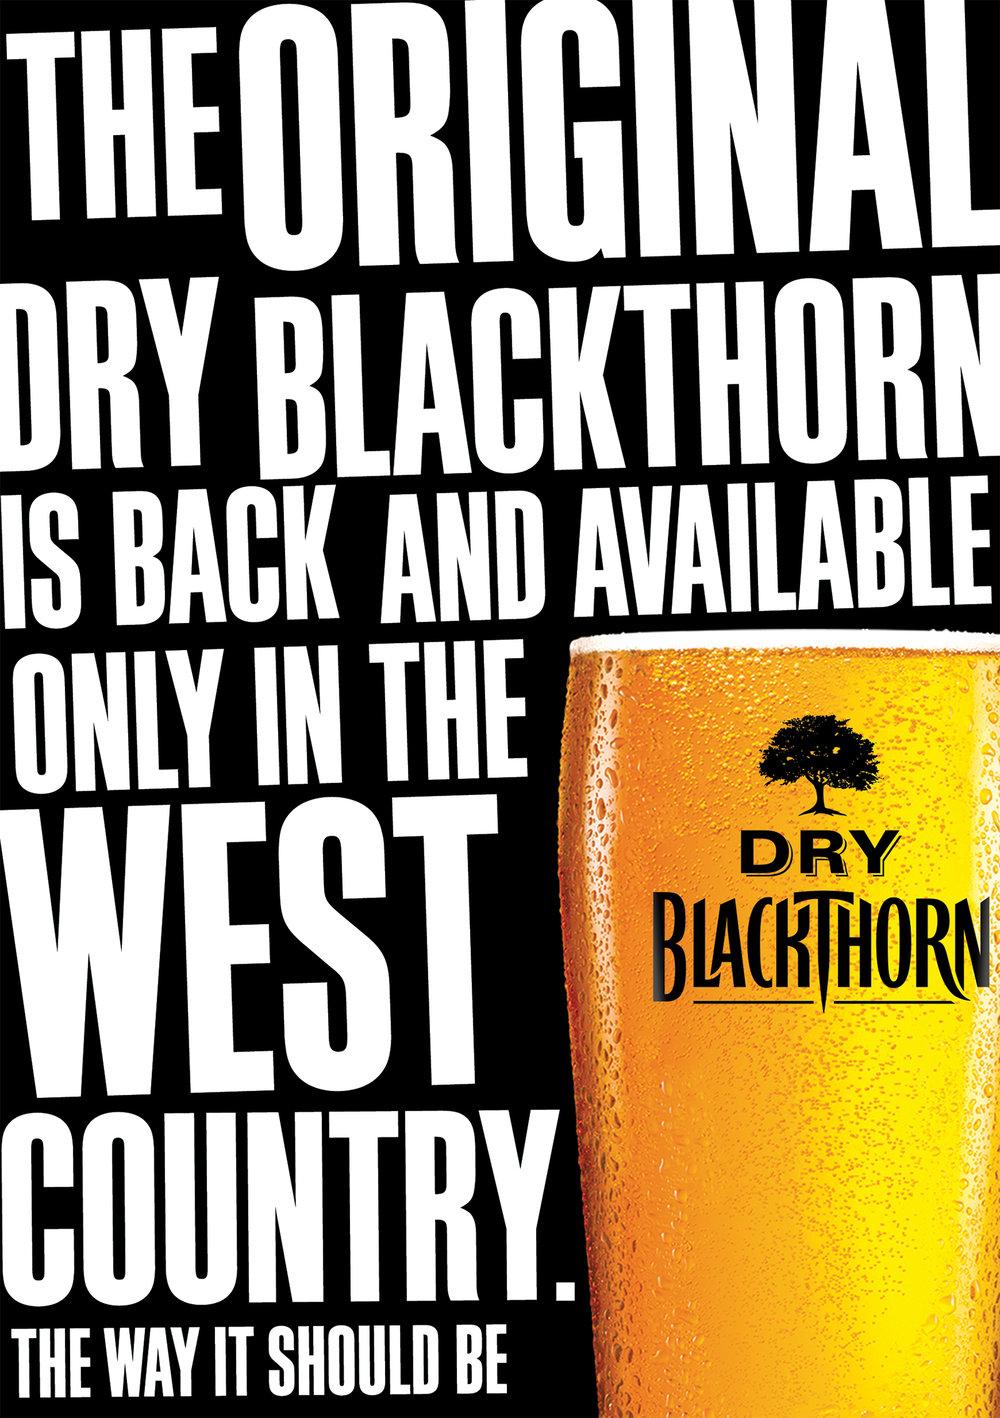 Dry Blackthorn | Designer | by James-Lee Duffy